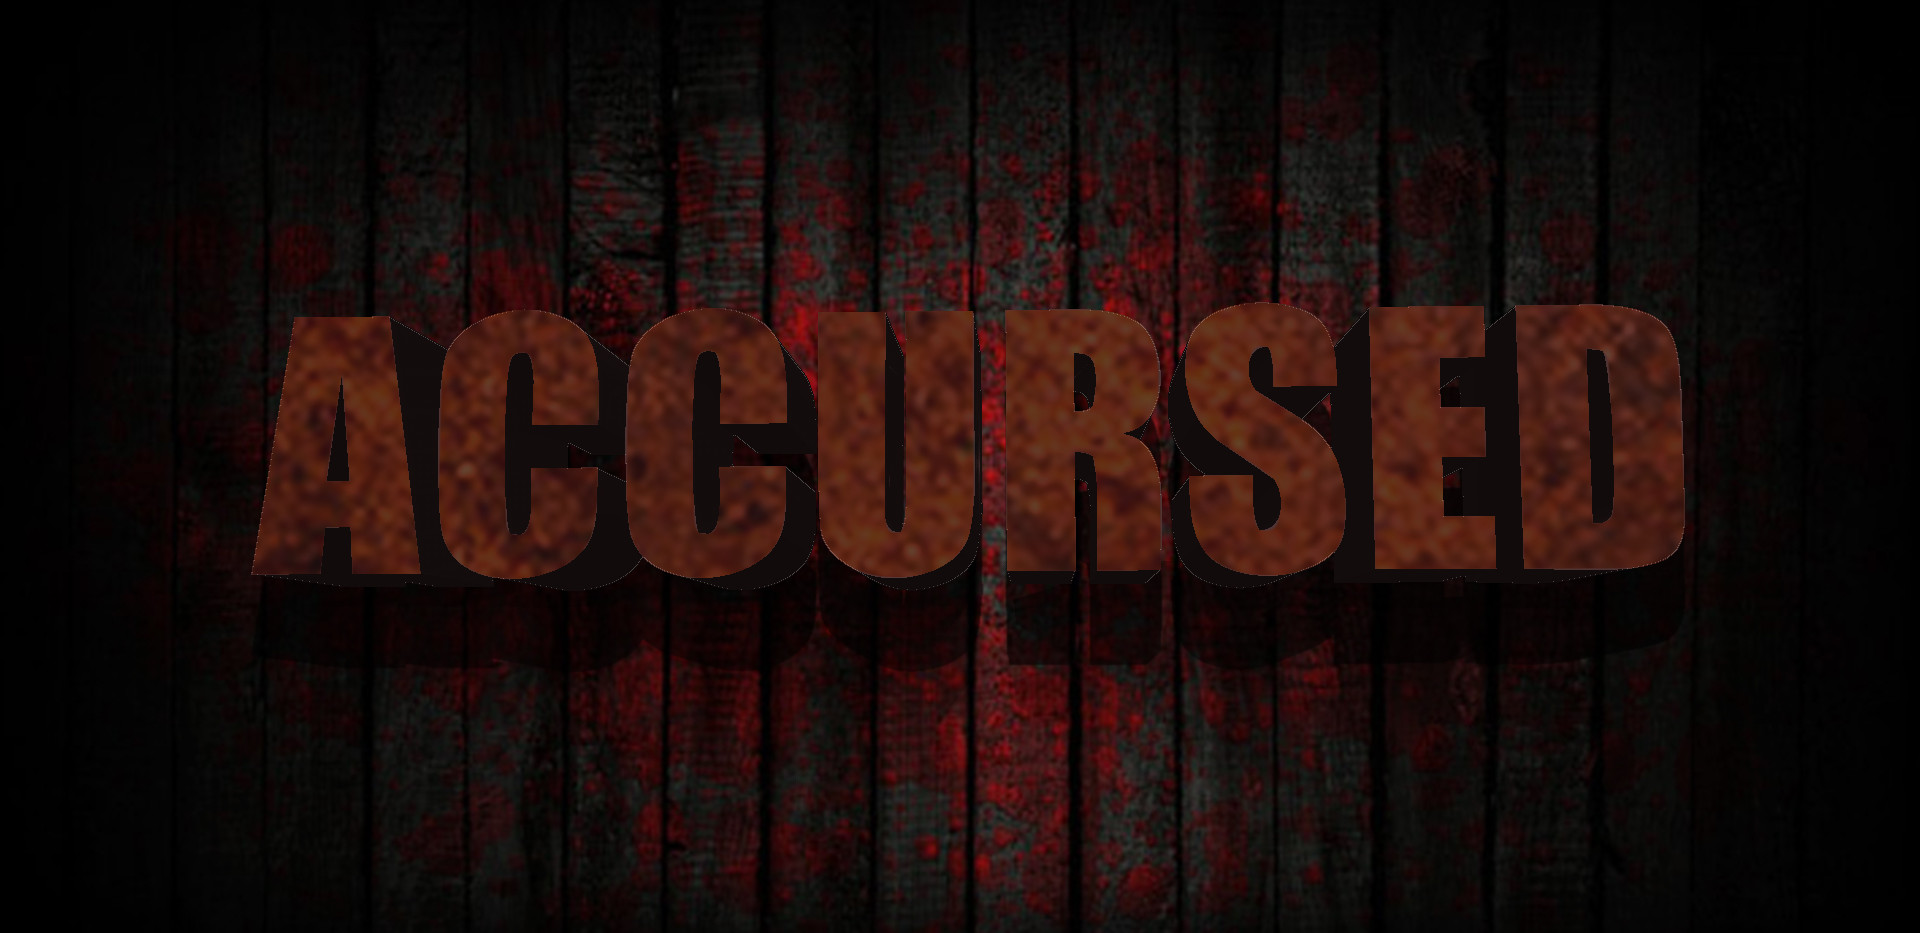 Accursed Campaign Intro